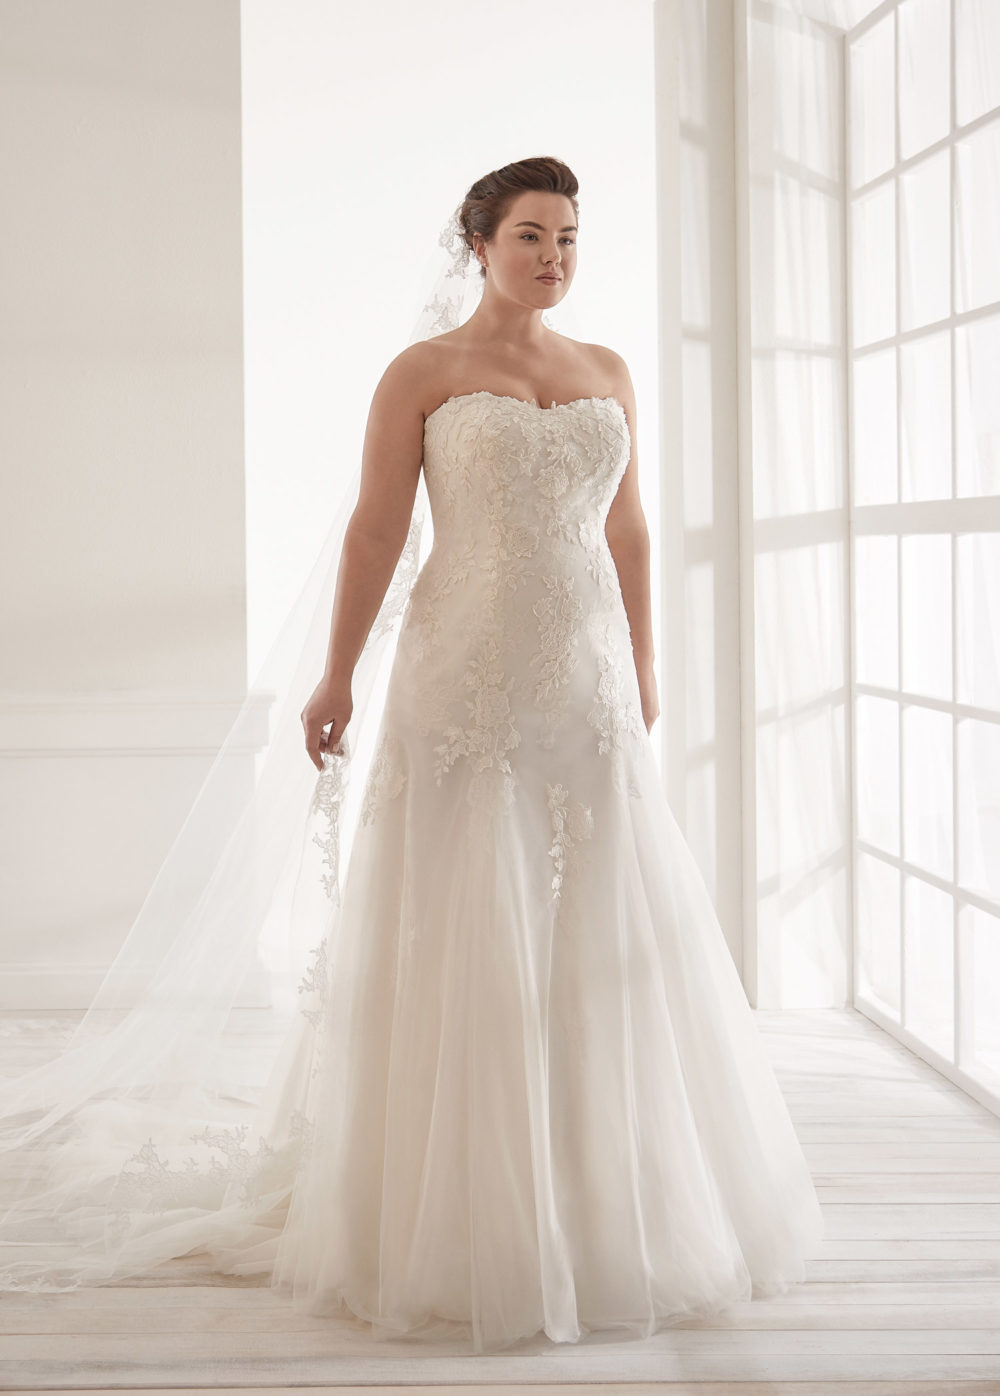 Mariages: abito da sposa Curvy 2020 a Vicenza, Verona, Padova, Veneto CVA20091